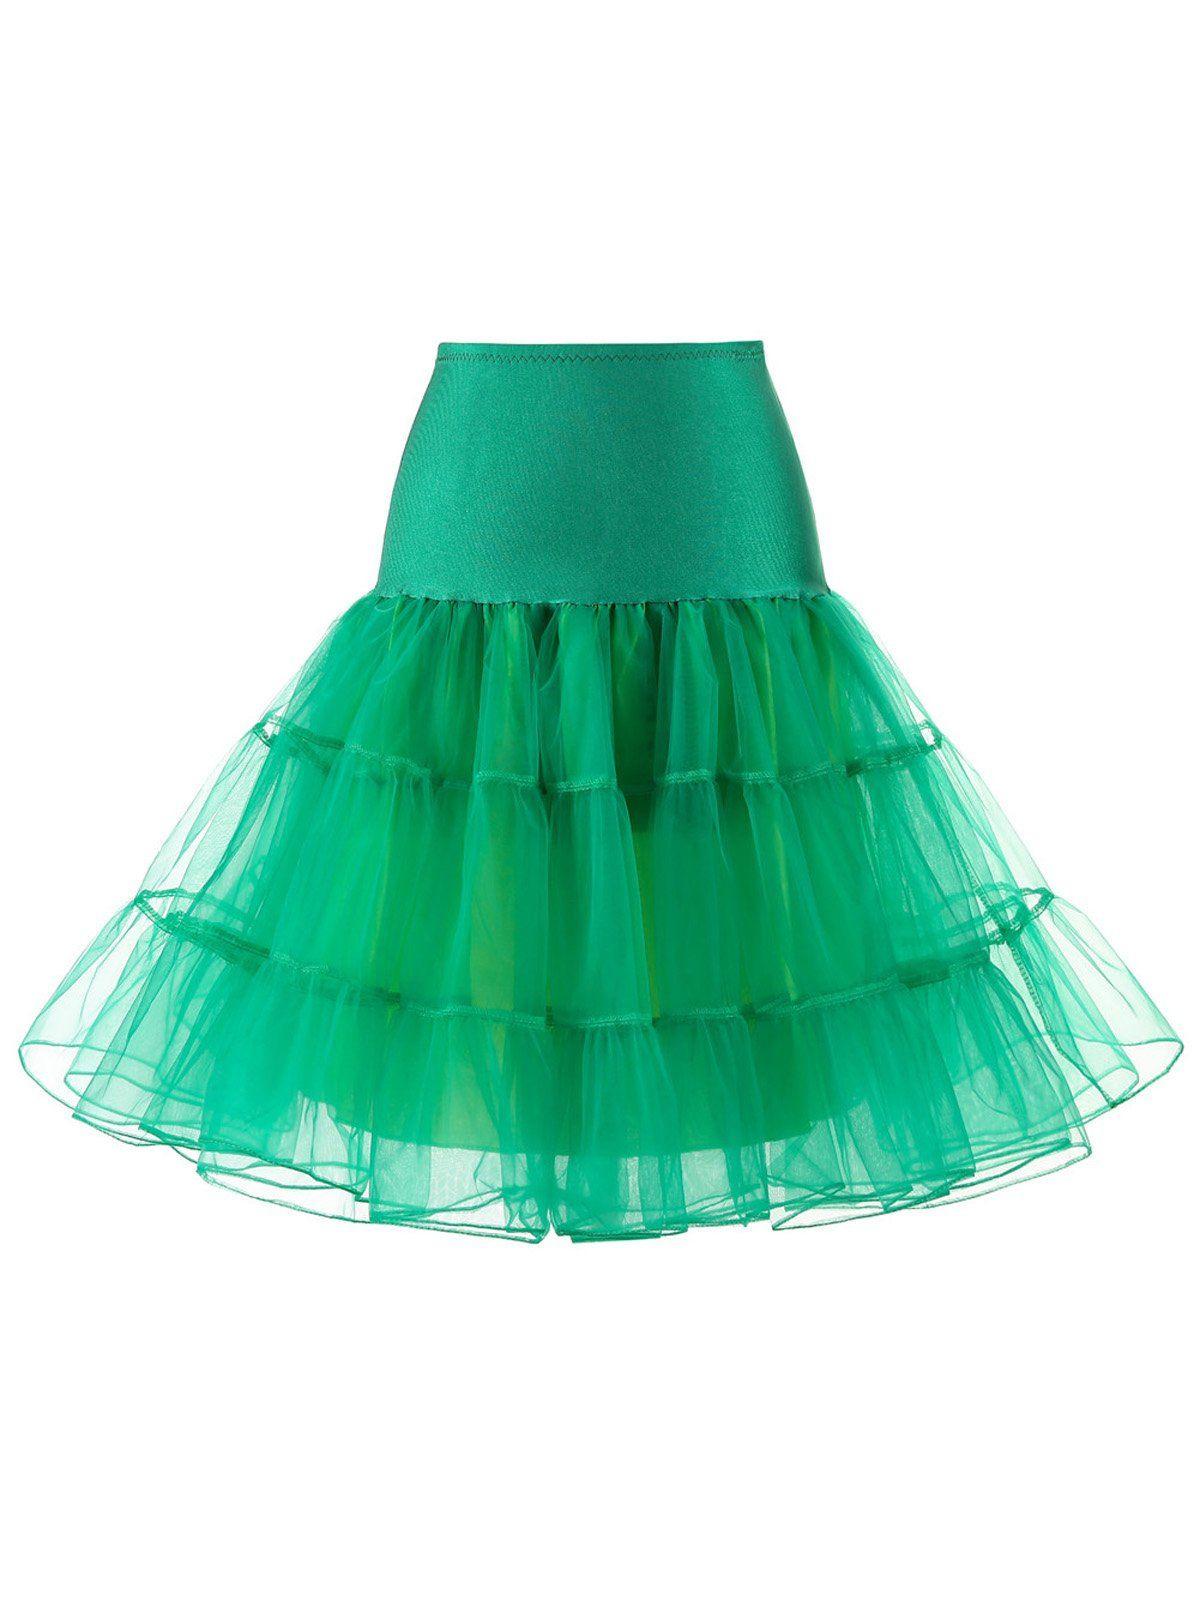 1950Er Petticoat Tutu Krinoline Unterrock  Unterrock